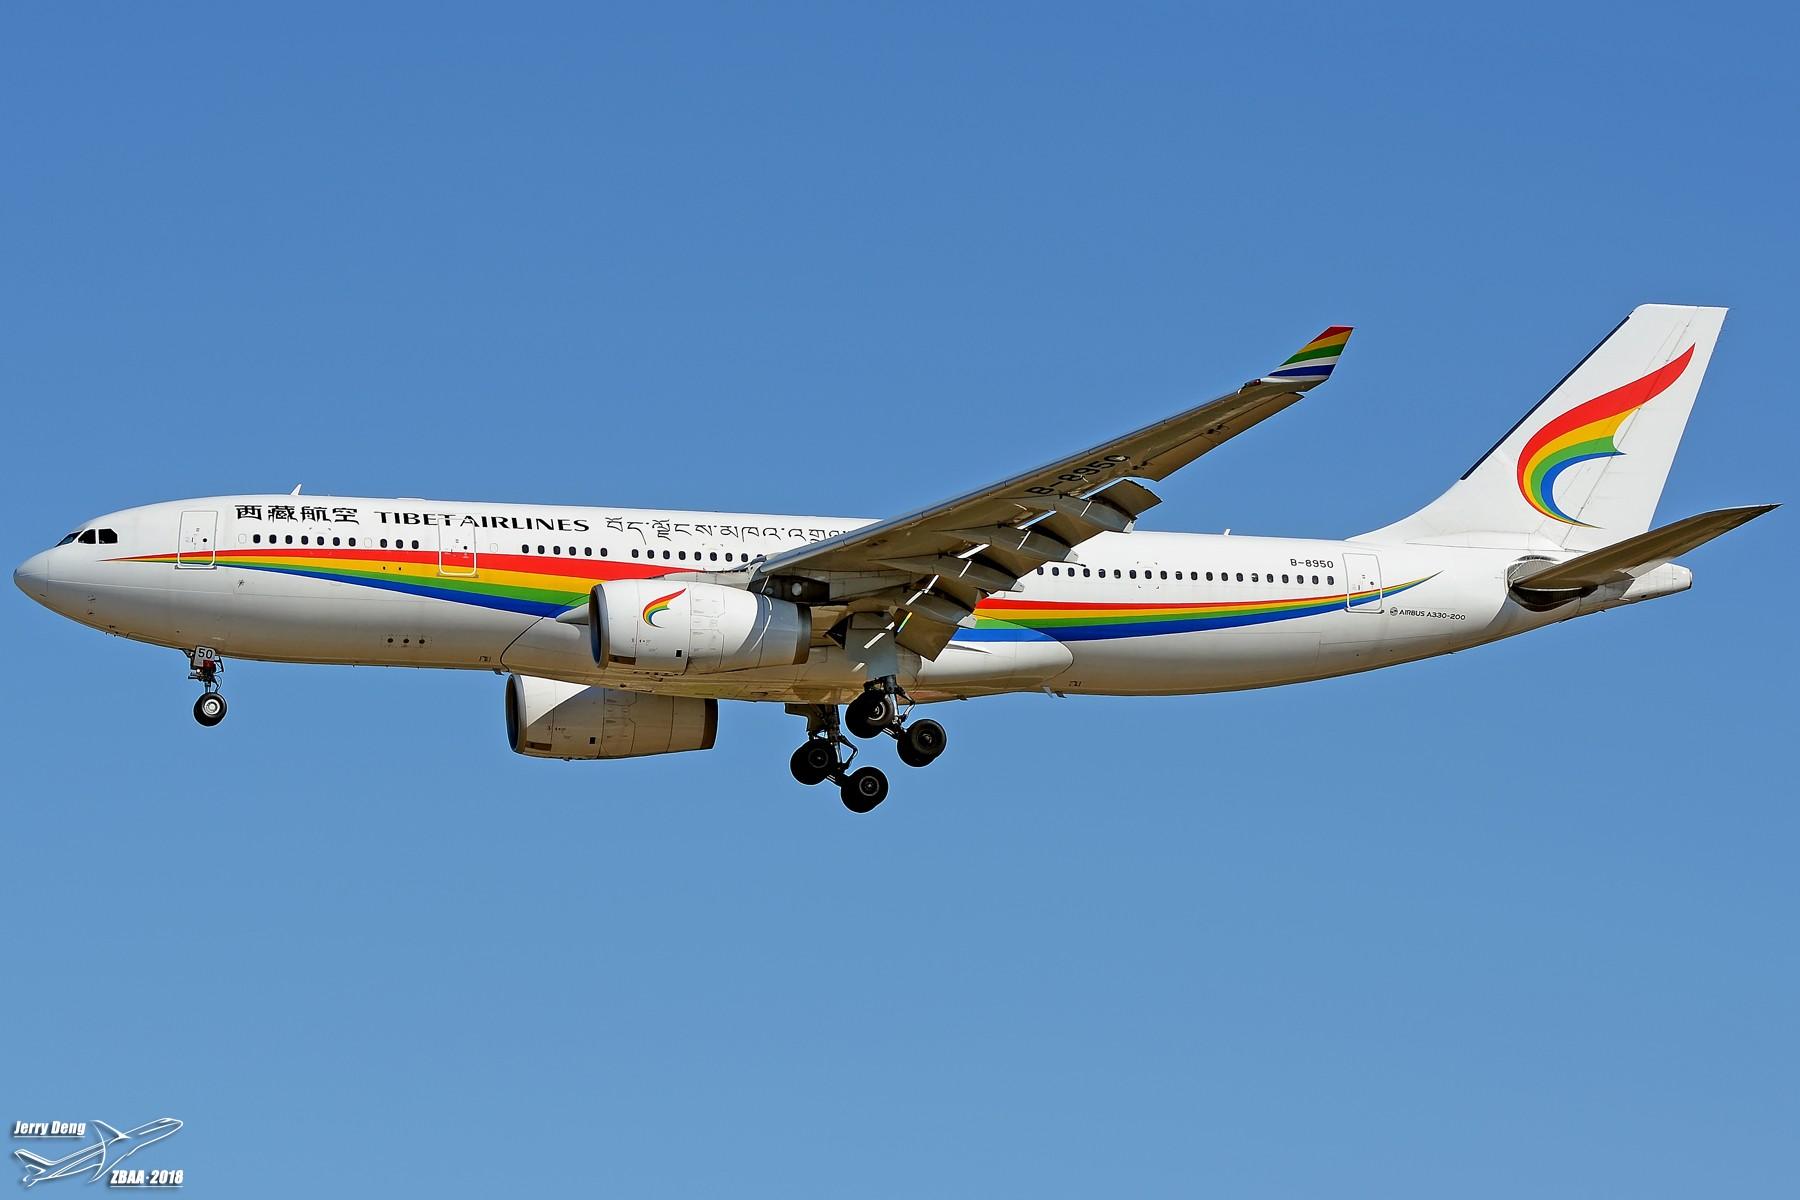 Re:[原创]【多图党】出差赶上天气不错ZBAA随拍 AIRBUS A330-200 B-8950 中国北京首都国际机场